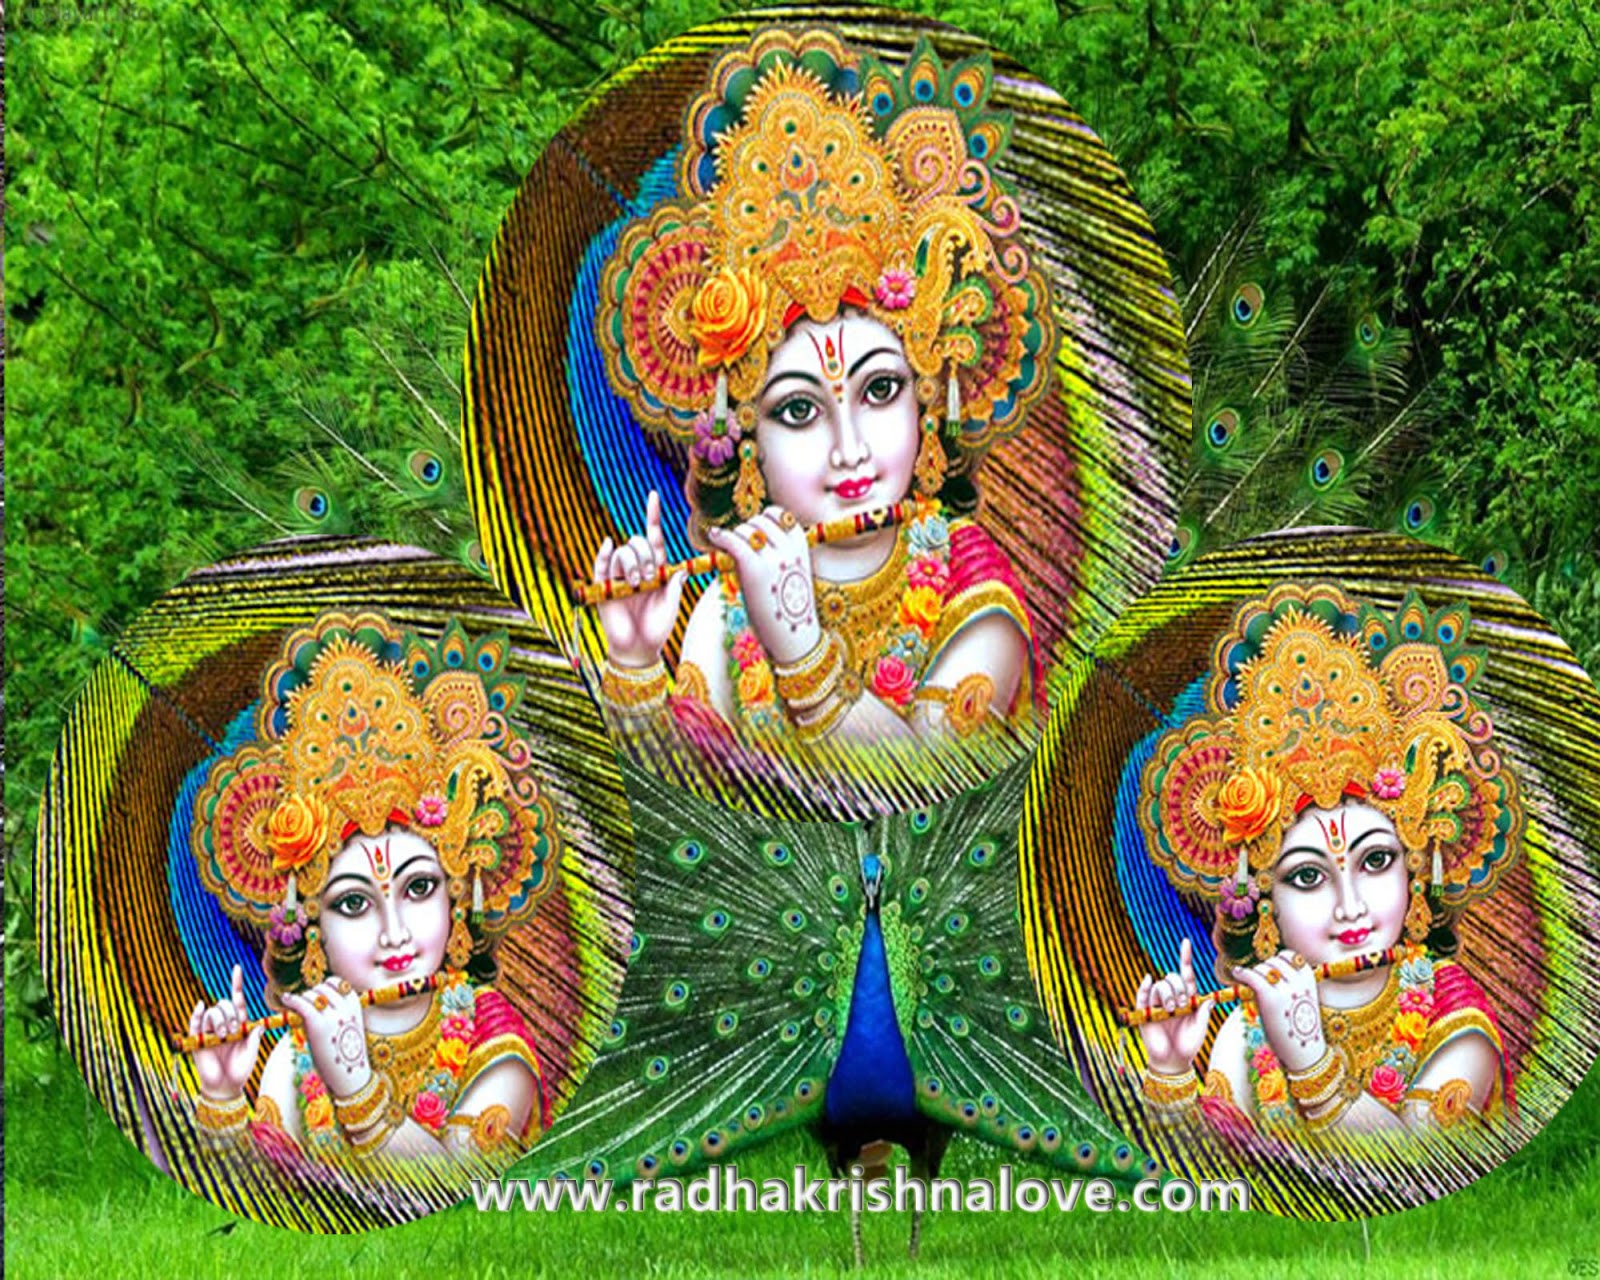 Radha Krishna Love Wallpapers